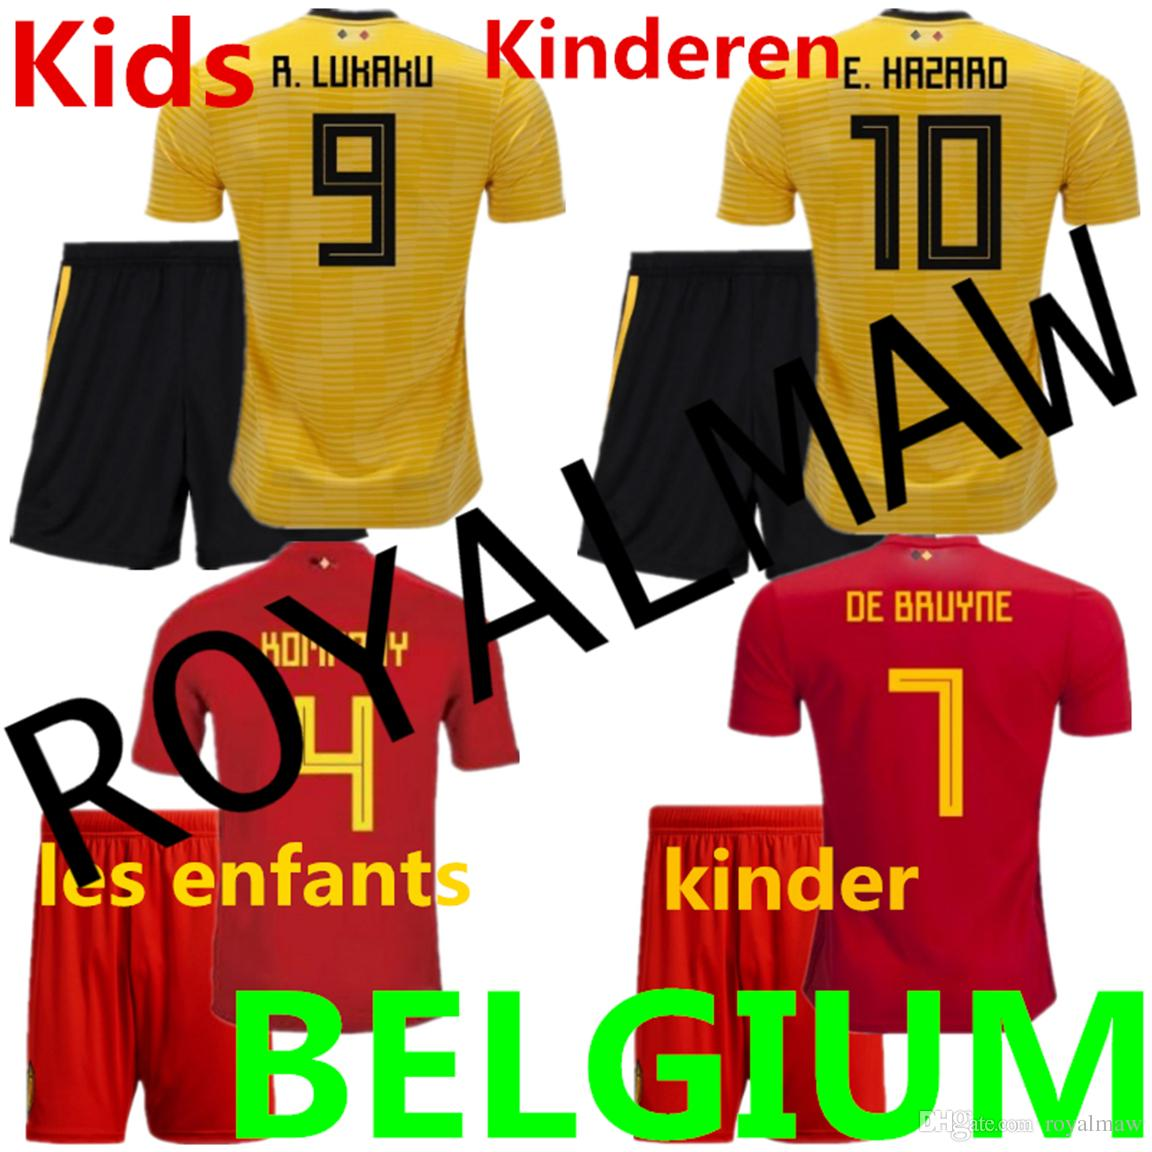 Belgium Kids Jersey 2018 World Cup Belgique Enfant Maillot De Foot Home Red  Away Yellow Belgien Football Uniform Kit België Child Clothes Top Thailalnd  R. ... d4a662c2b